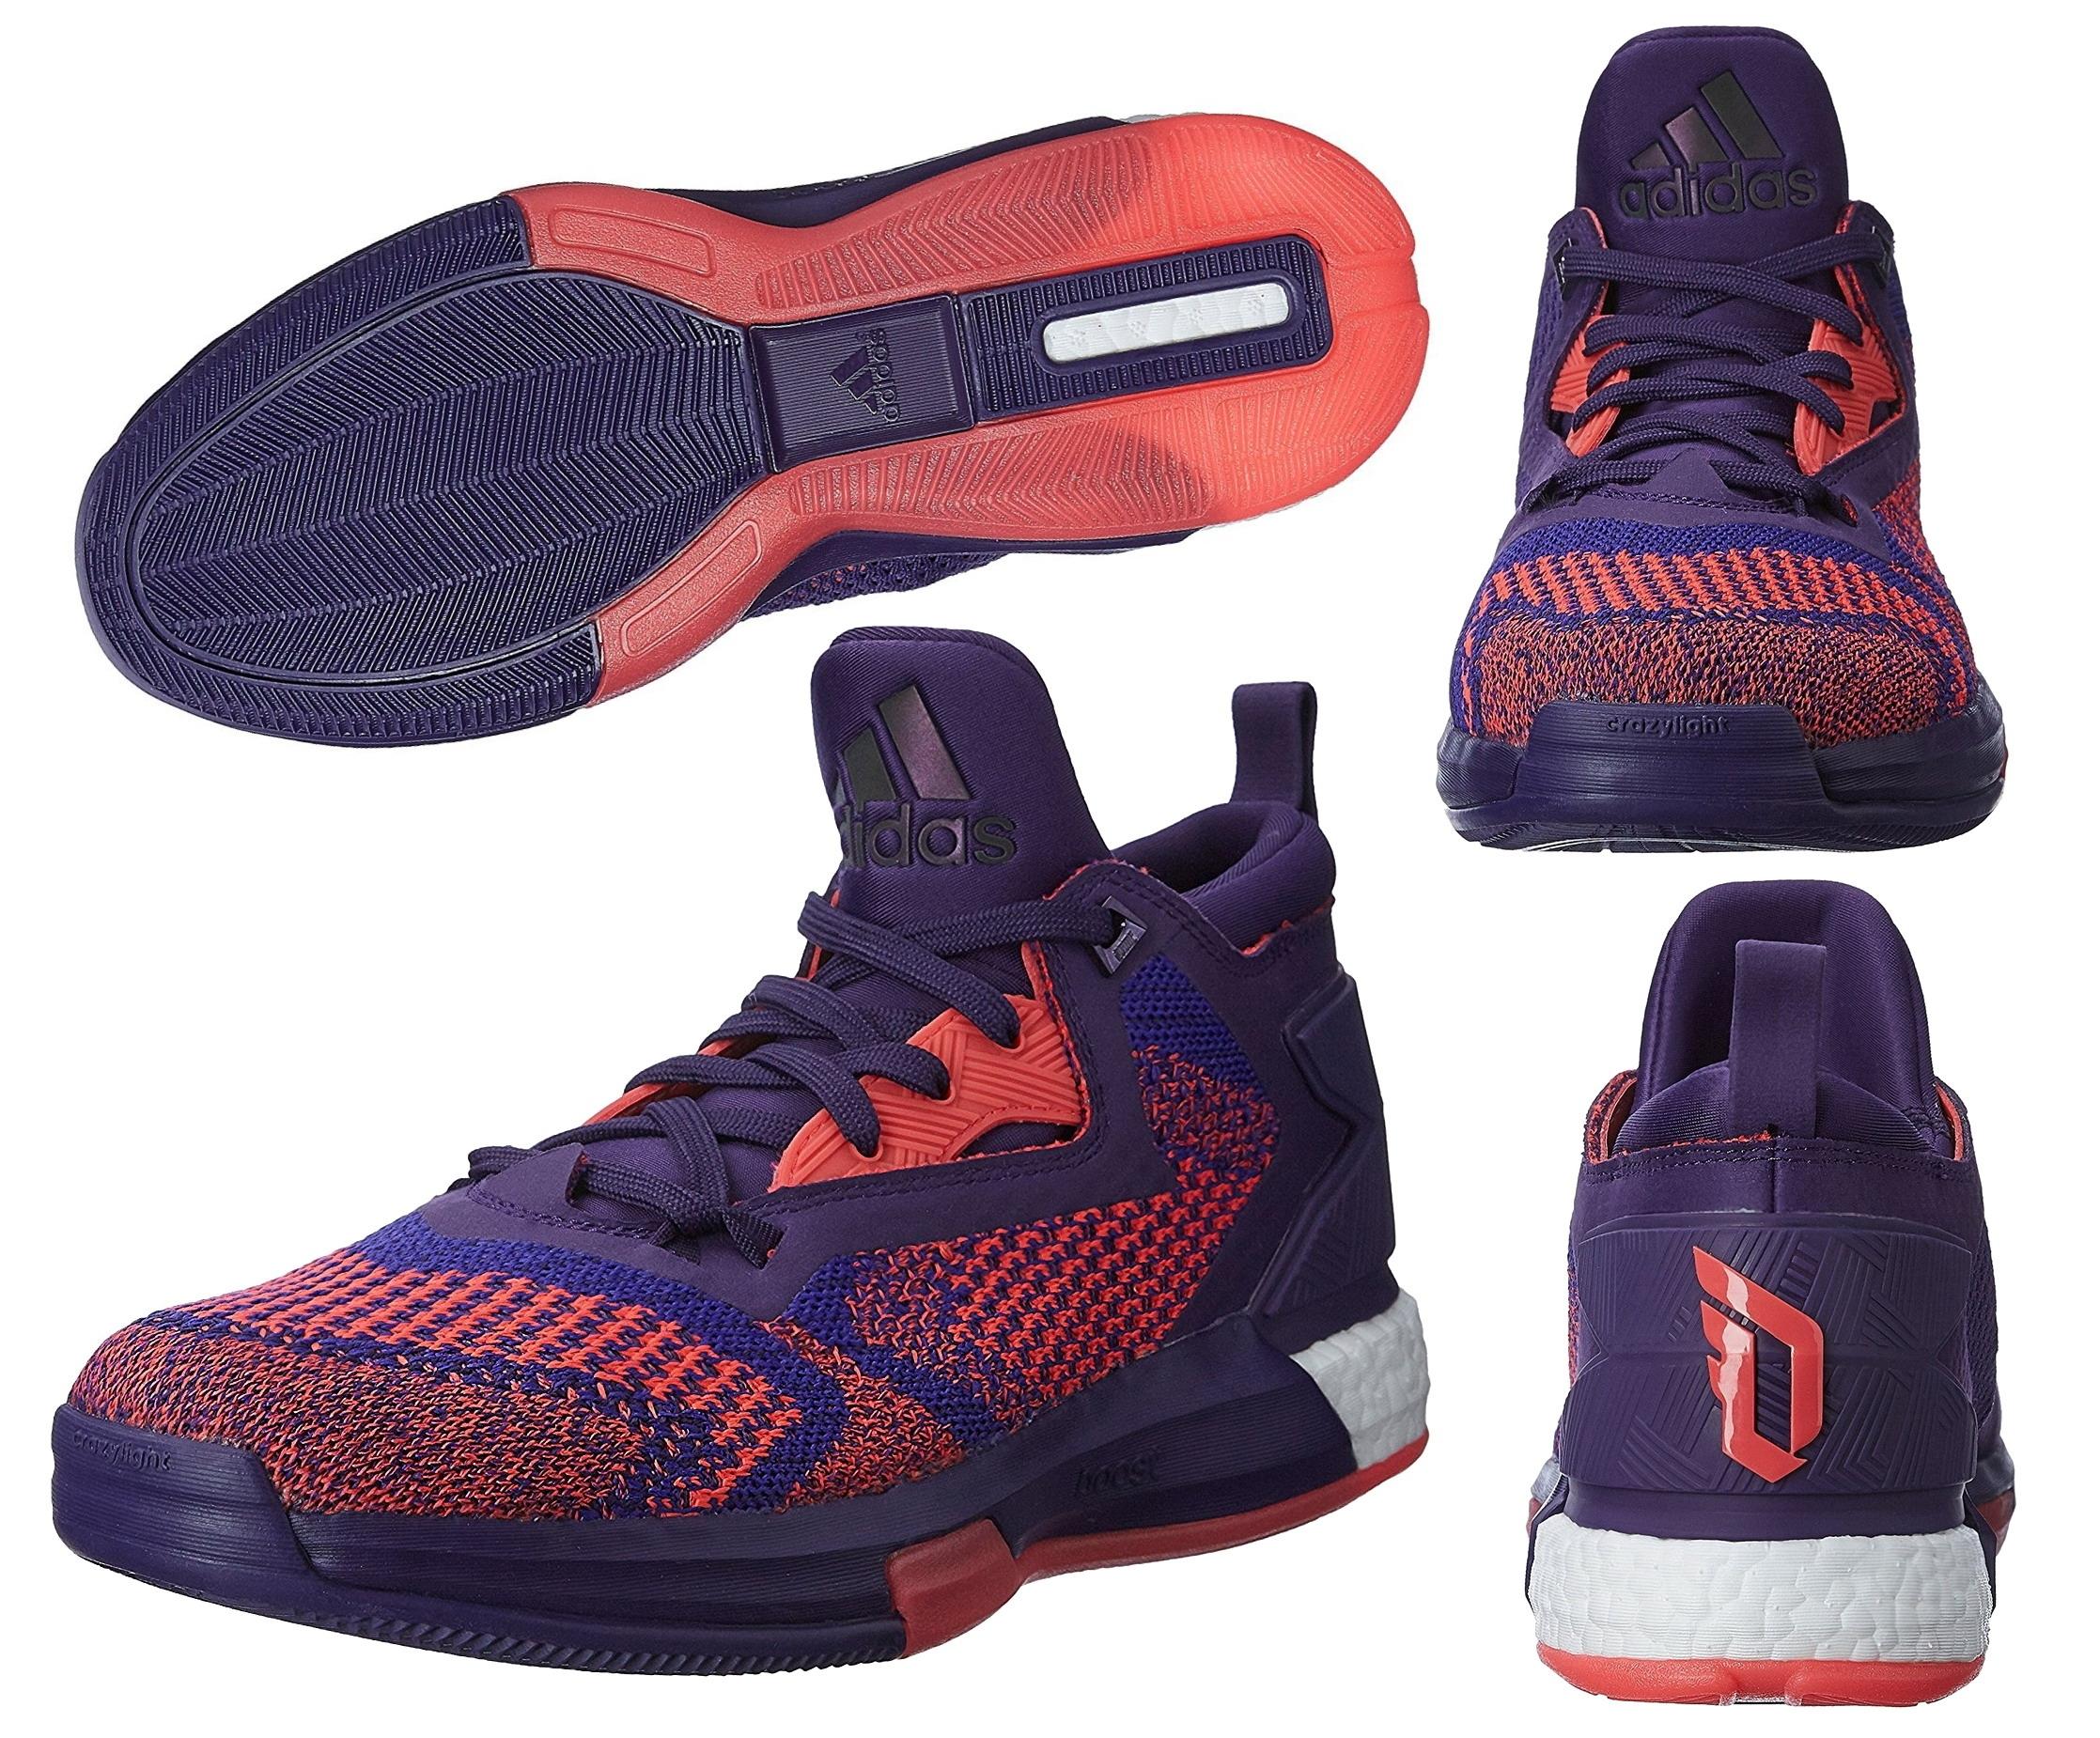 more photos c3510 fa3a4 Adidas D Lillard 2 Boost buty do koszykówki 42 23